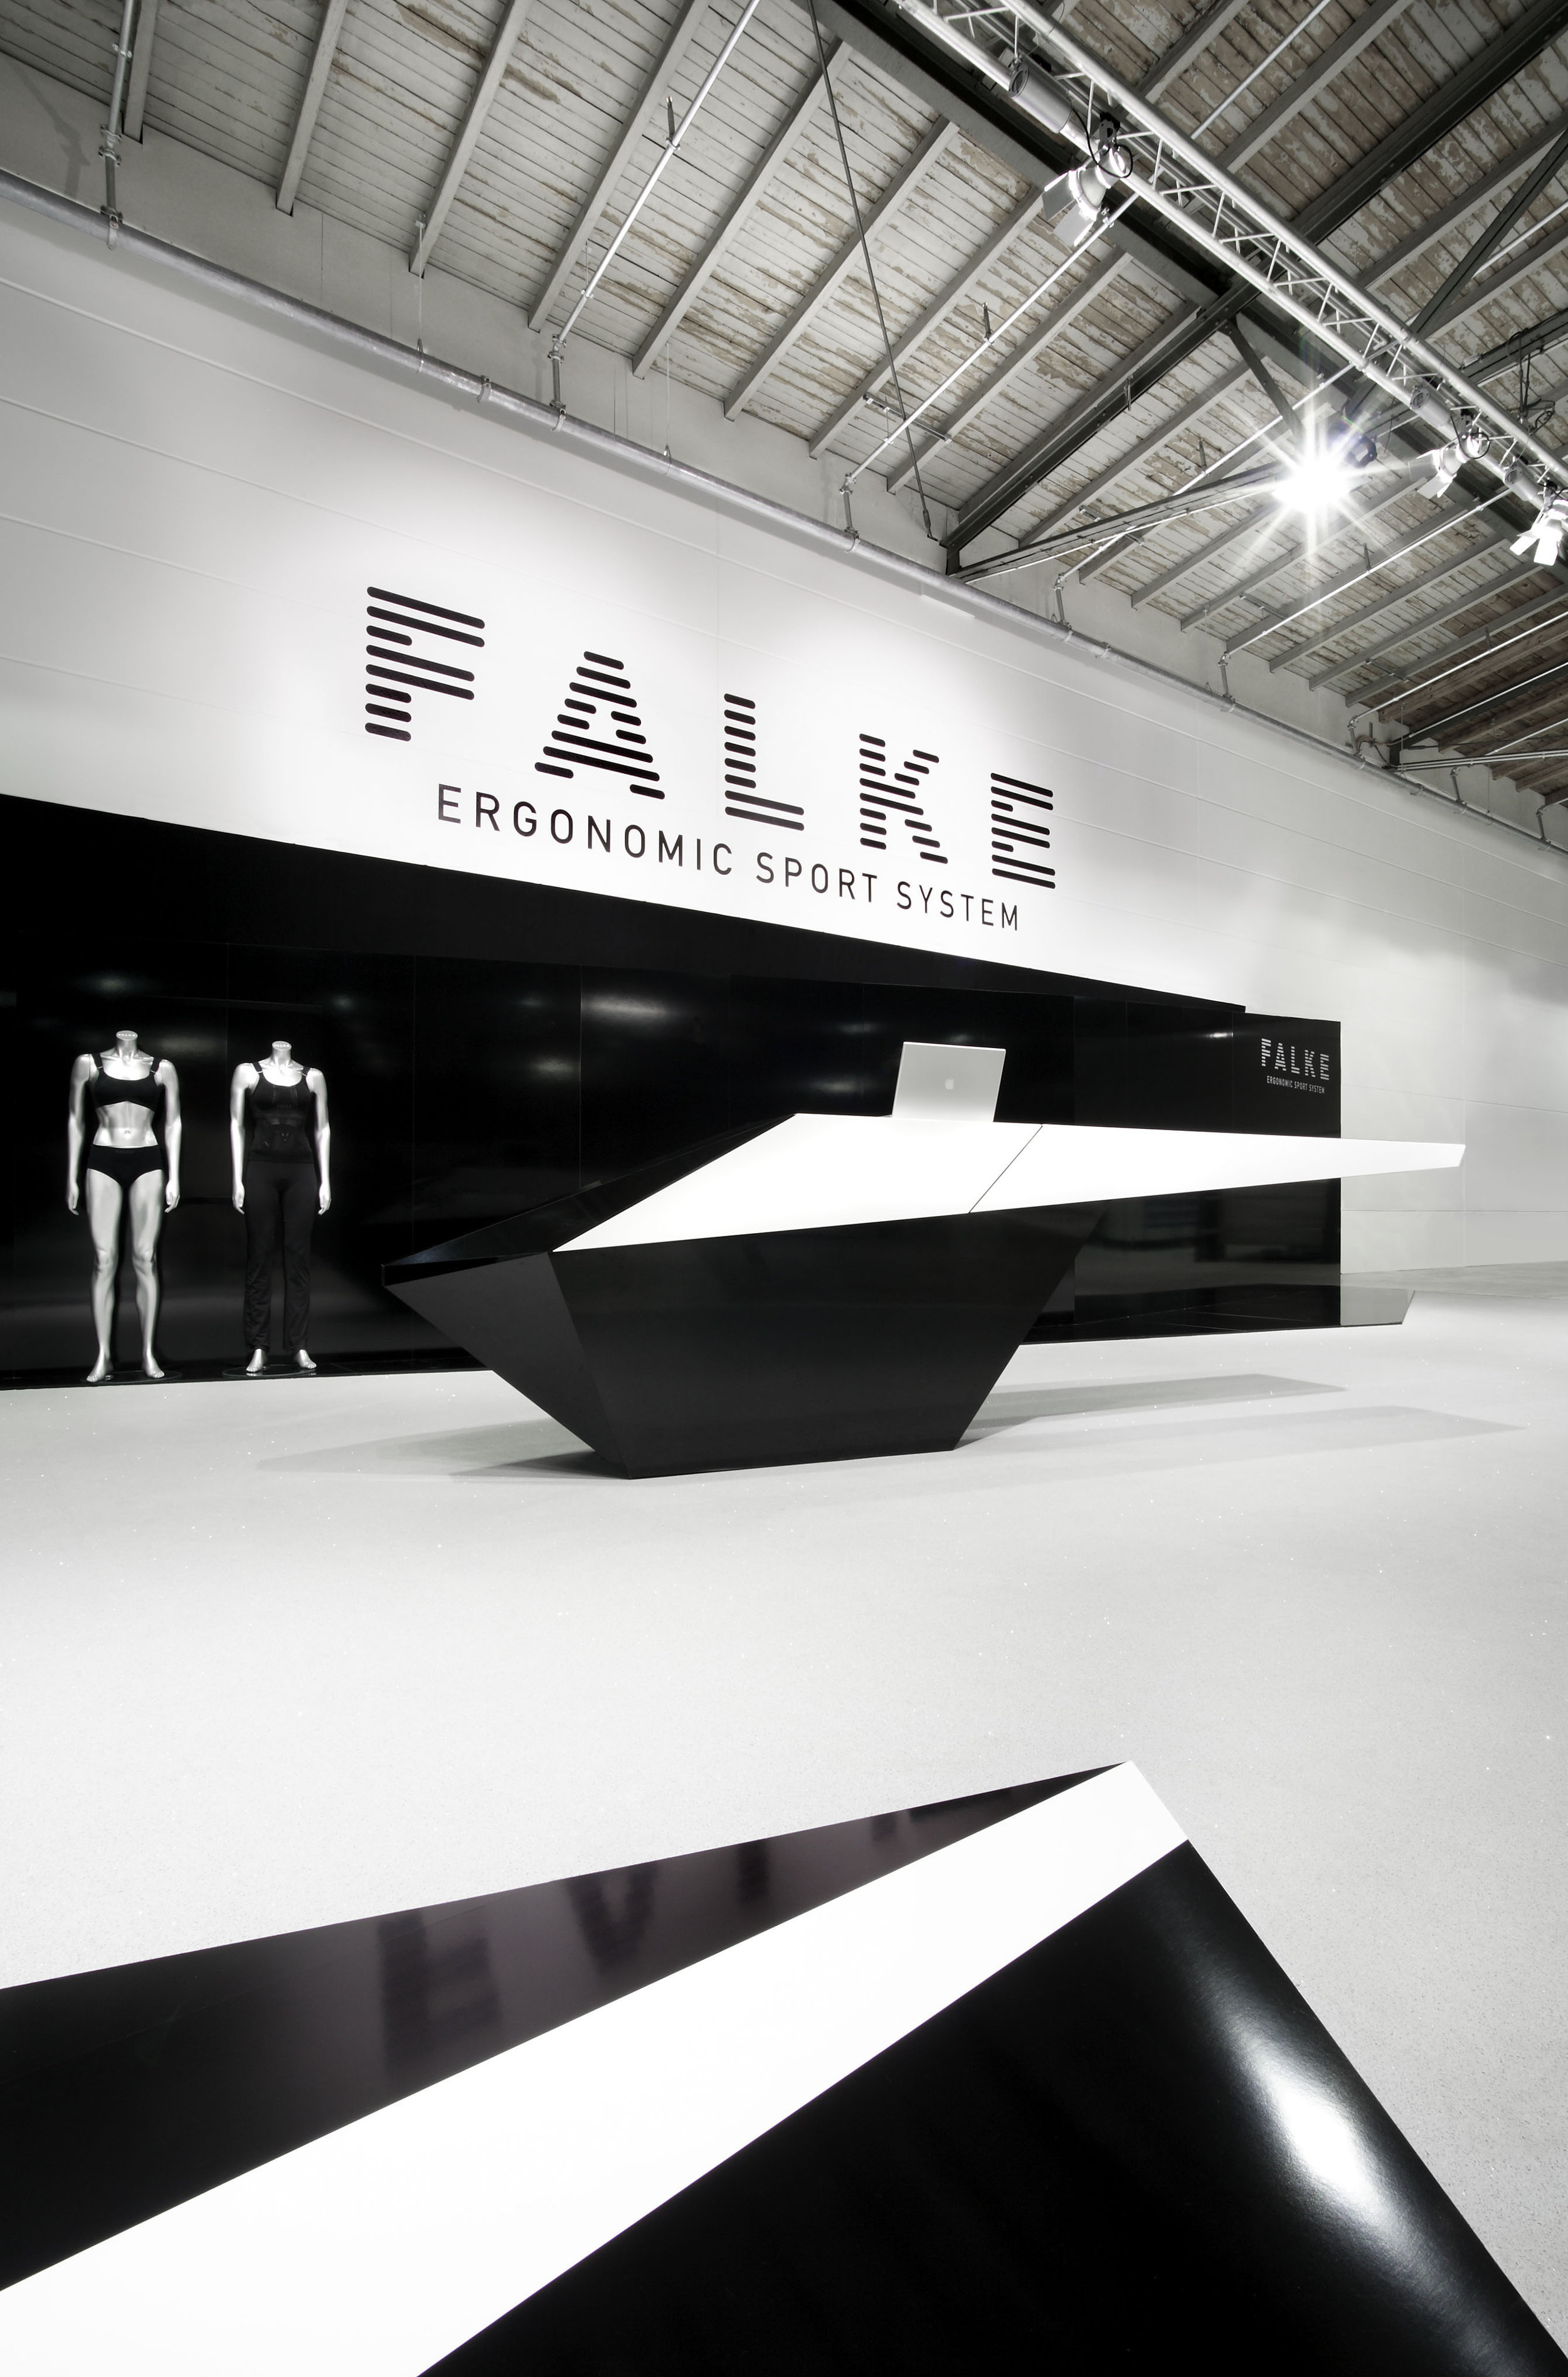 falke_tradefair-exhibition-design_coordination-berlin_02.jpg